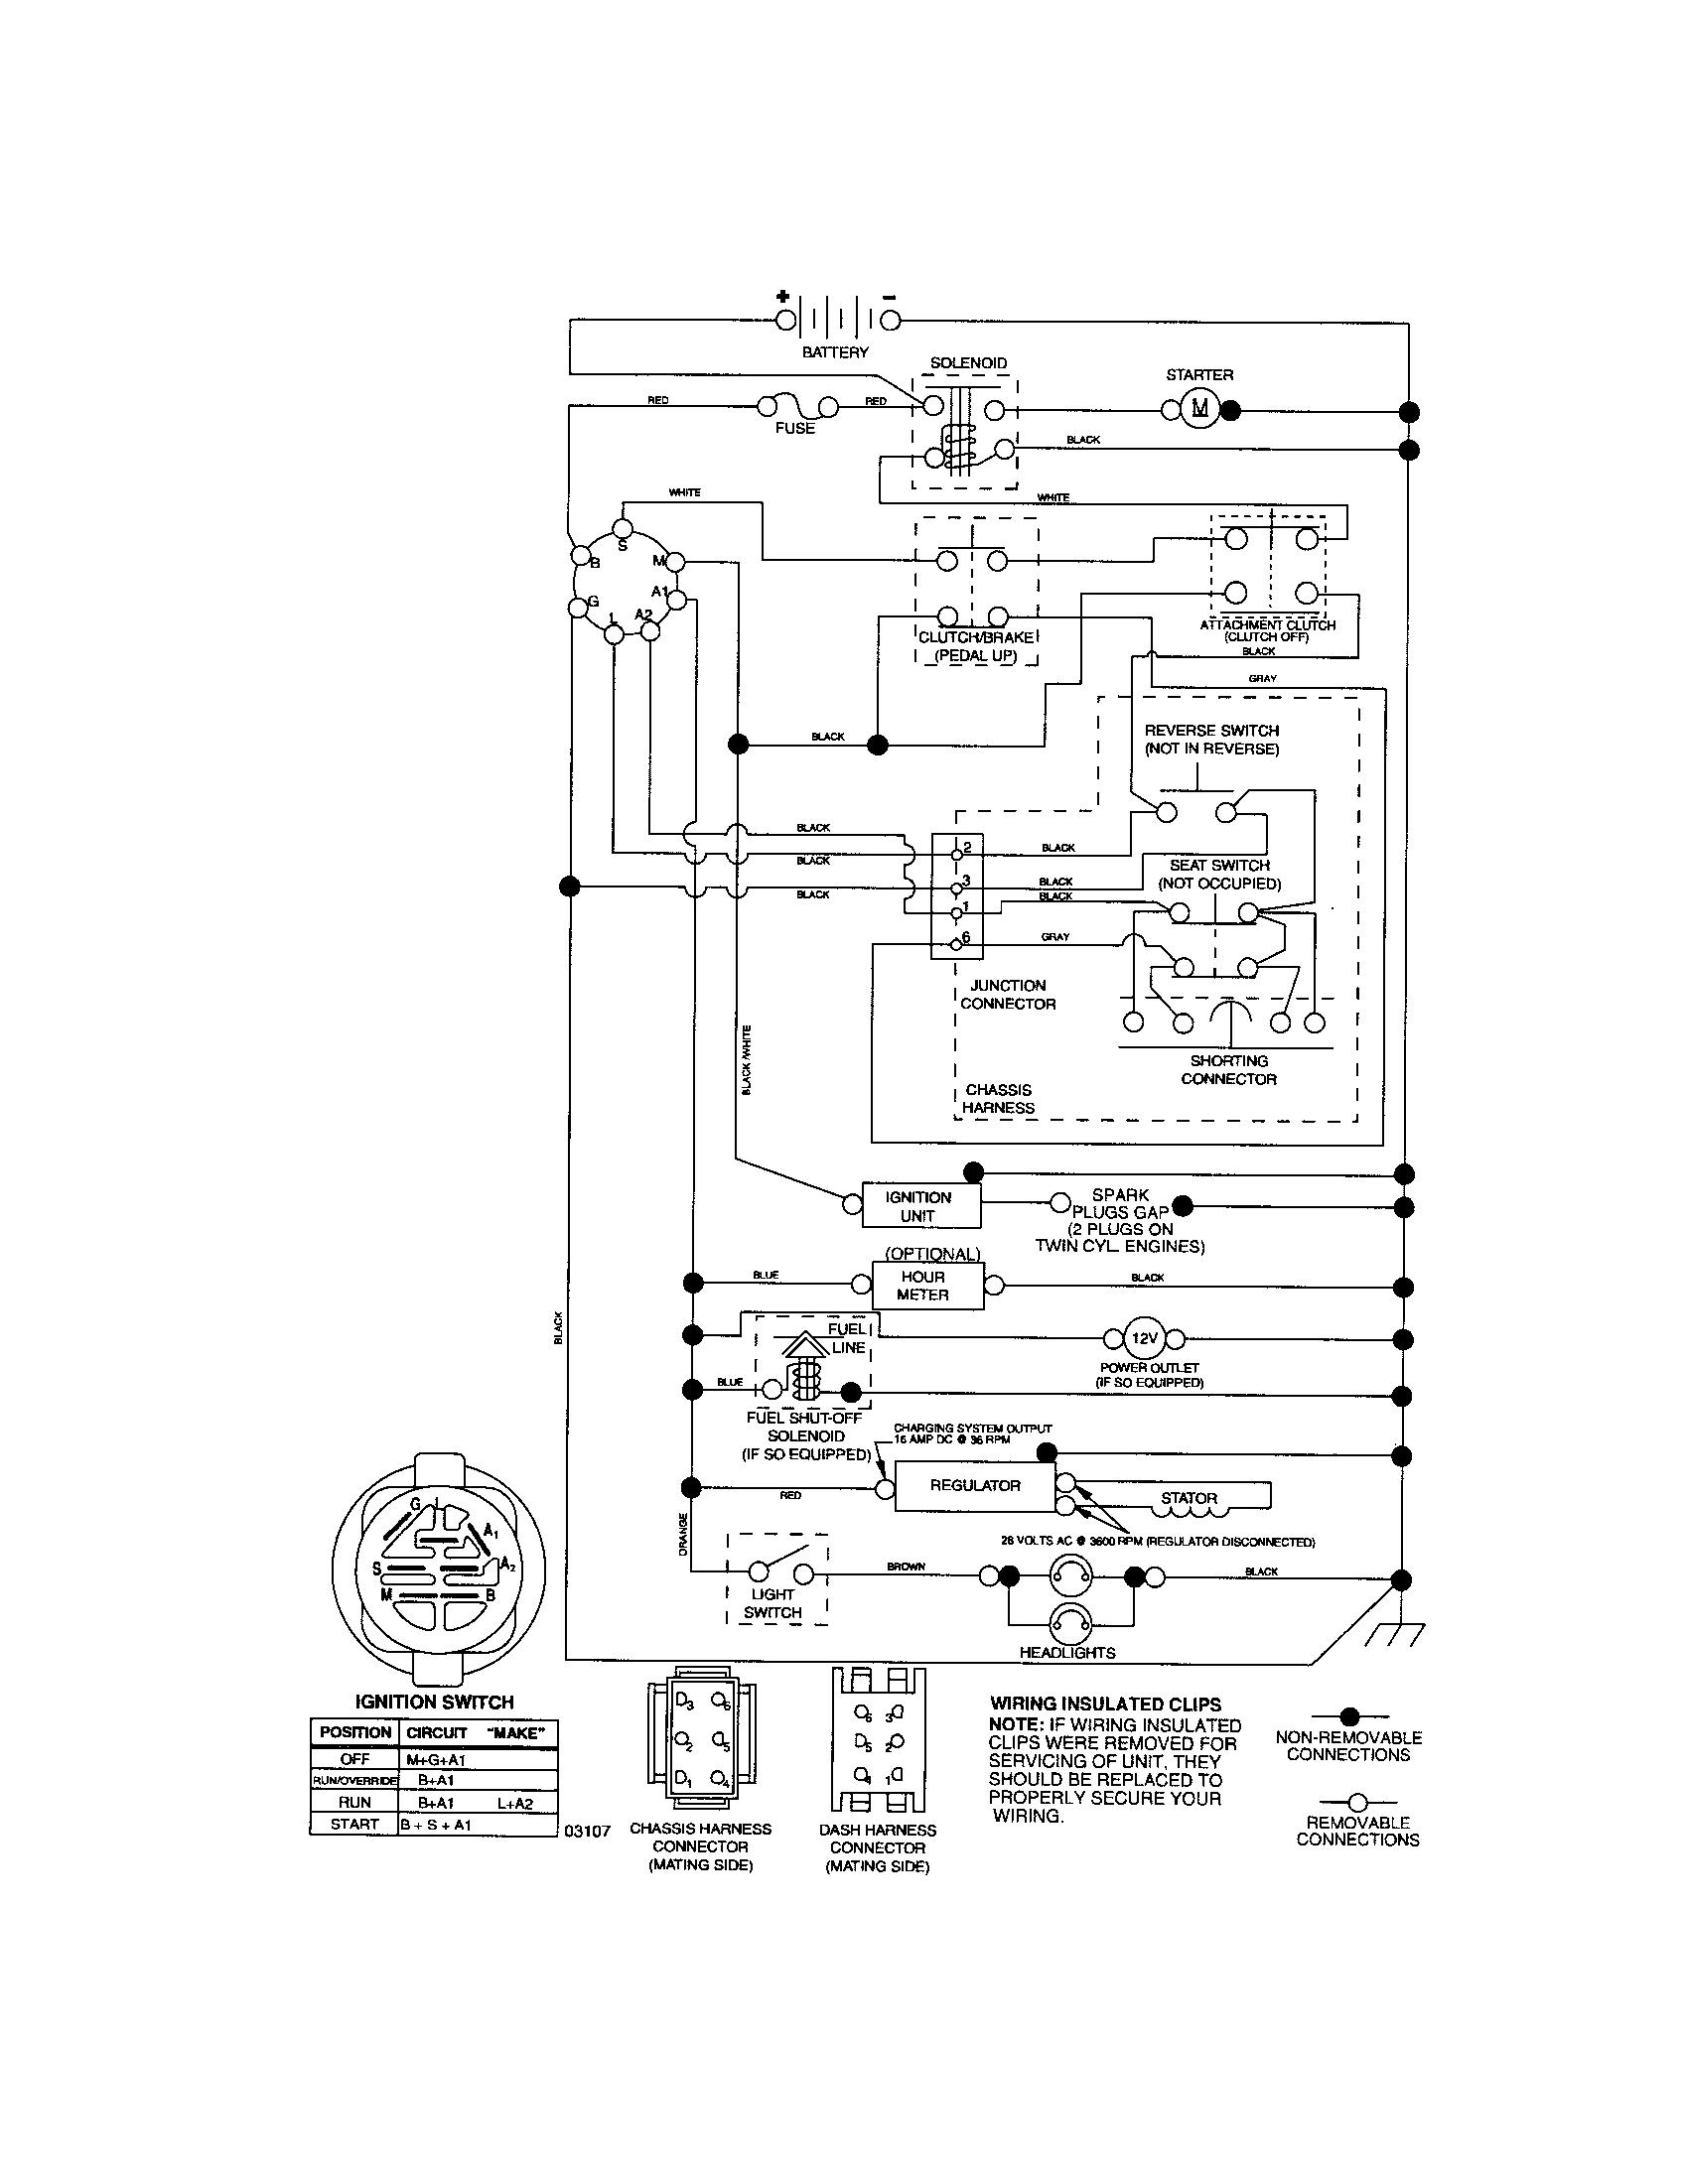 6 Prong Lawn Mower Starter Solenoid Wiring Diagram on